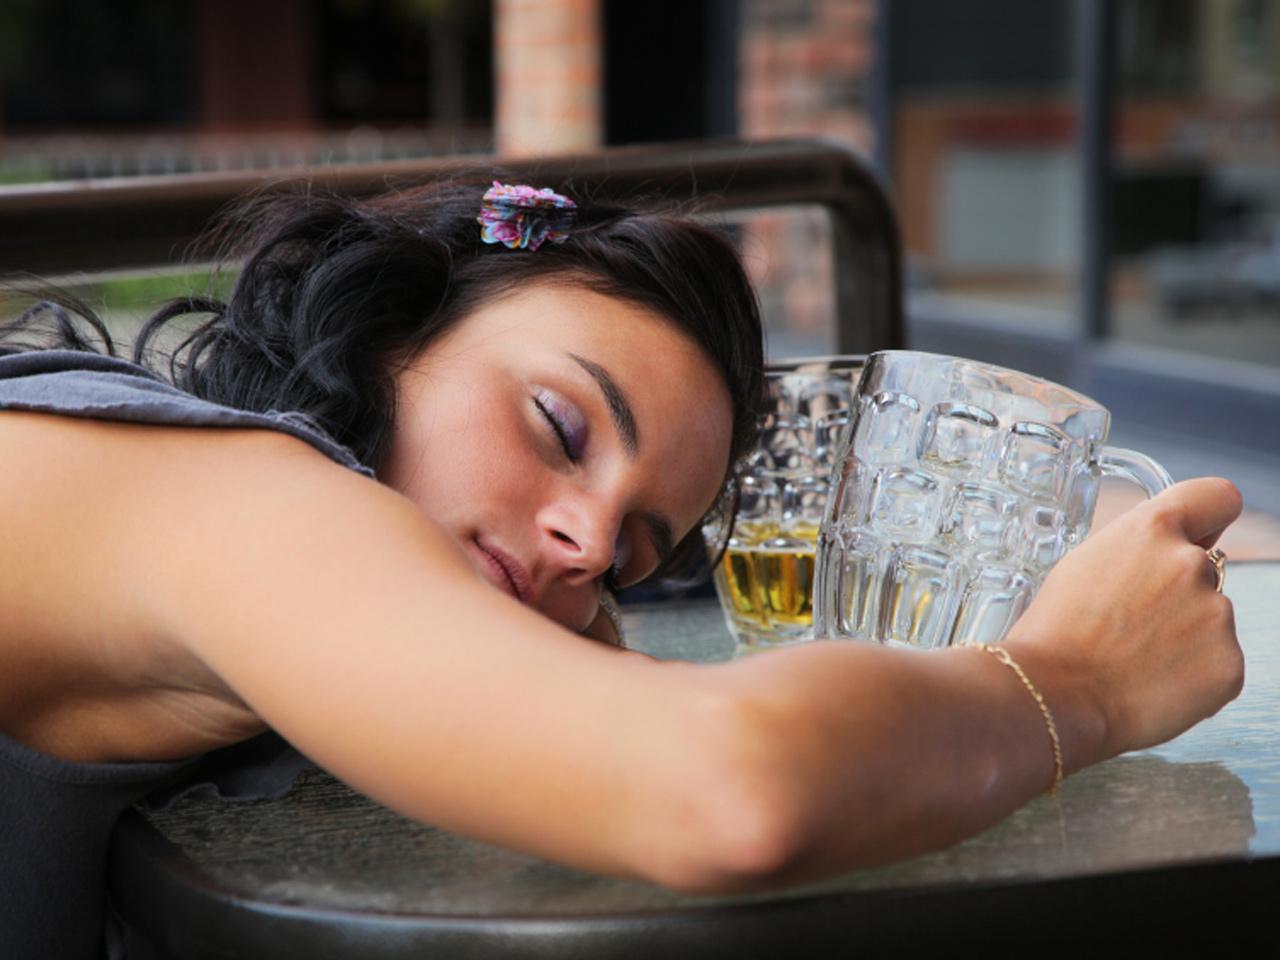 history of teen alcoholism